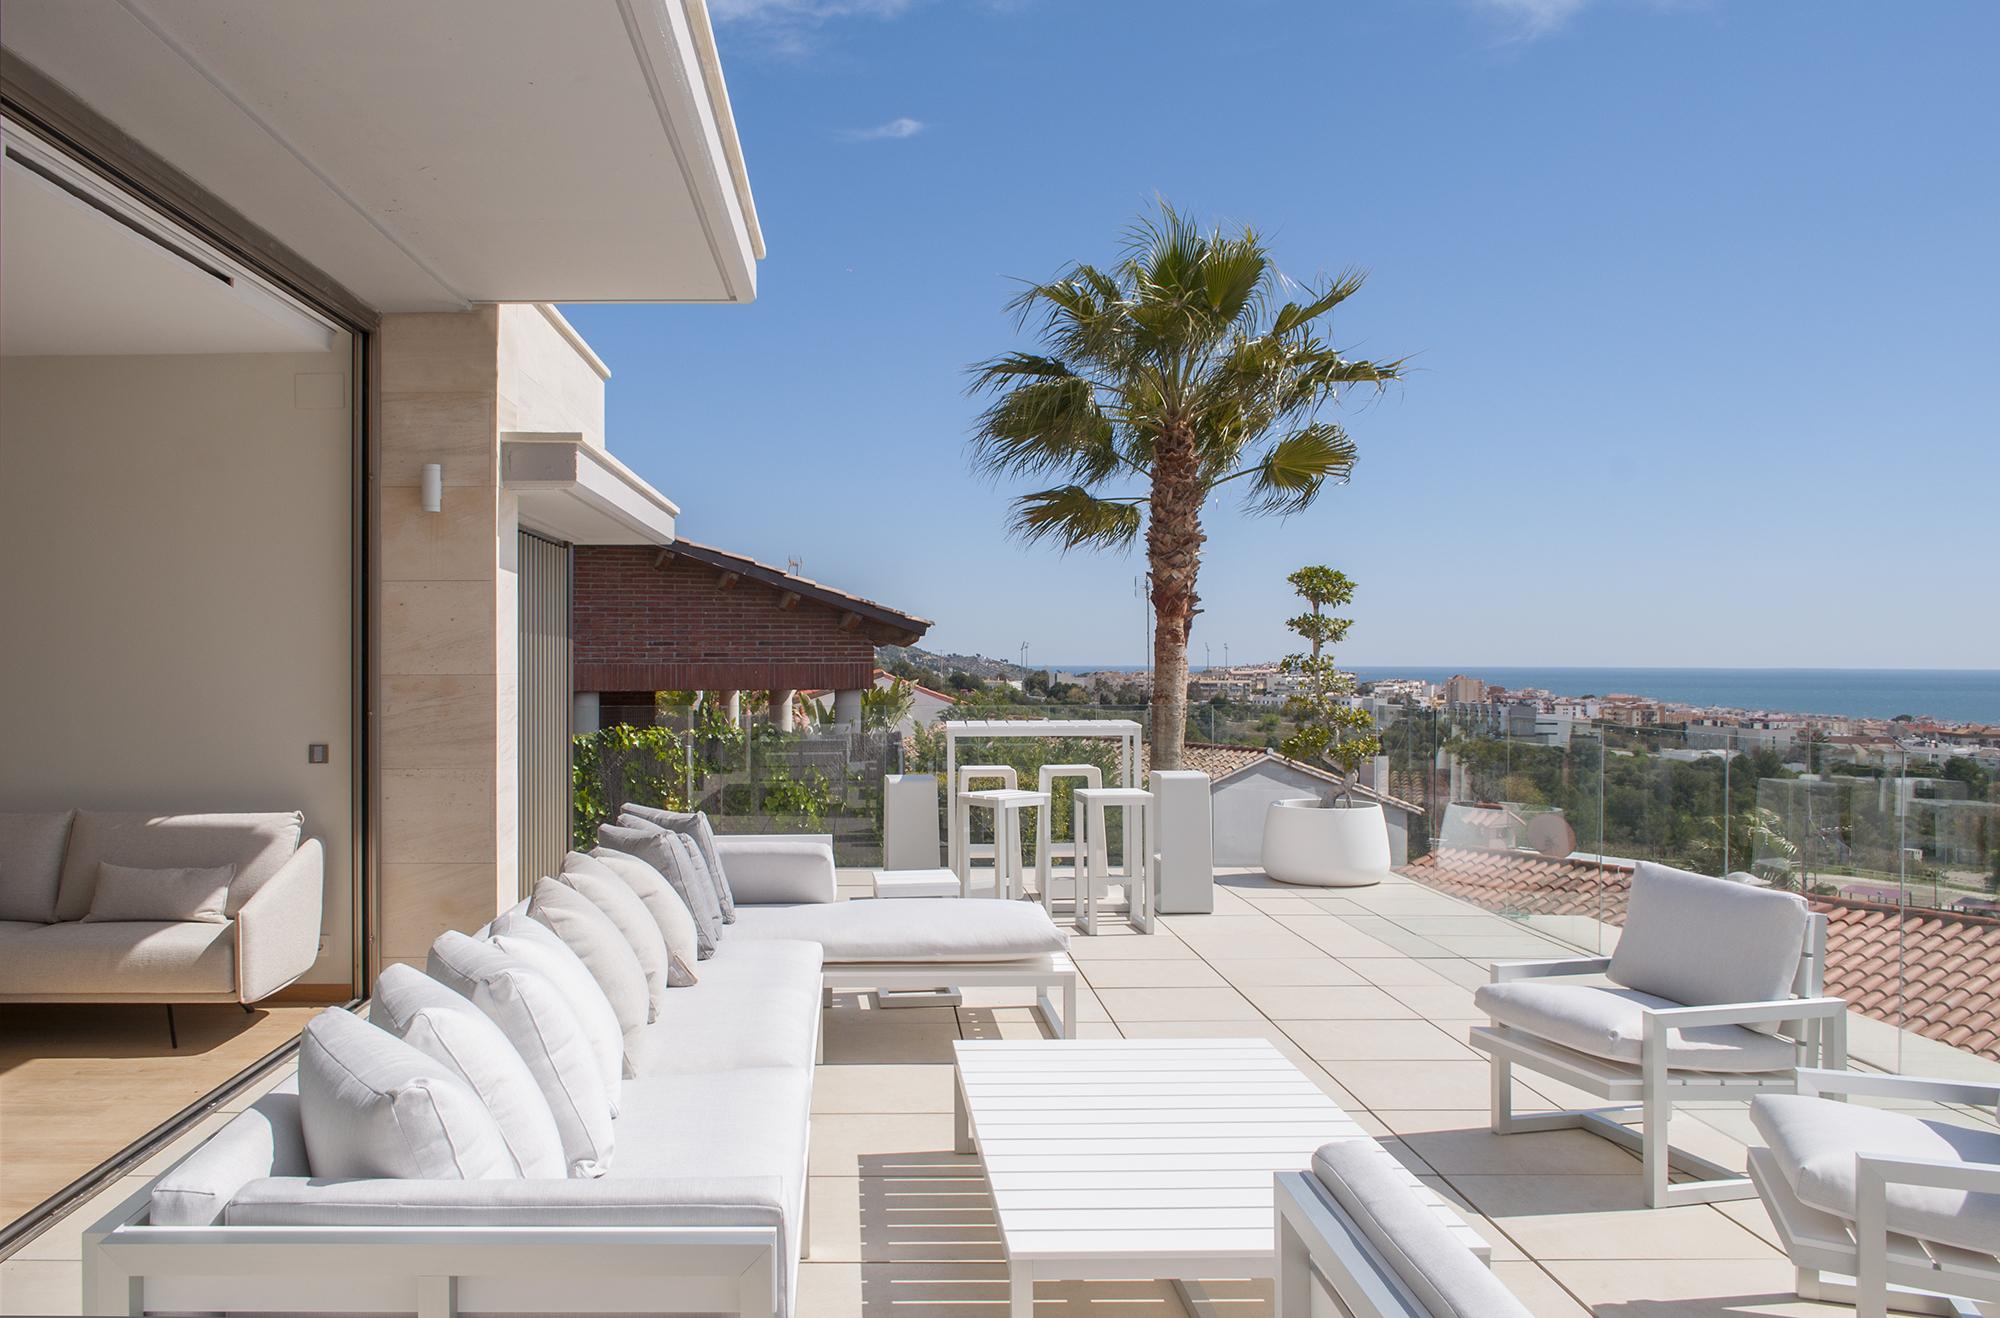 10-rardo-architects-casas-en-sitges-vista-al-mar-terraza